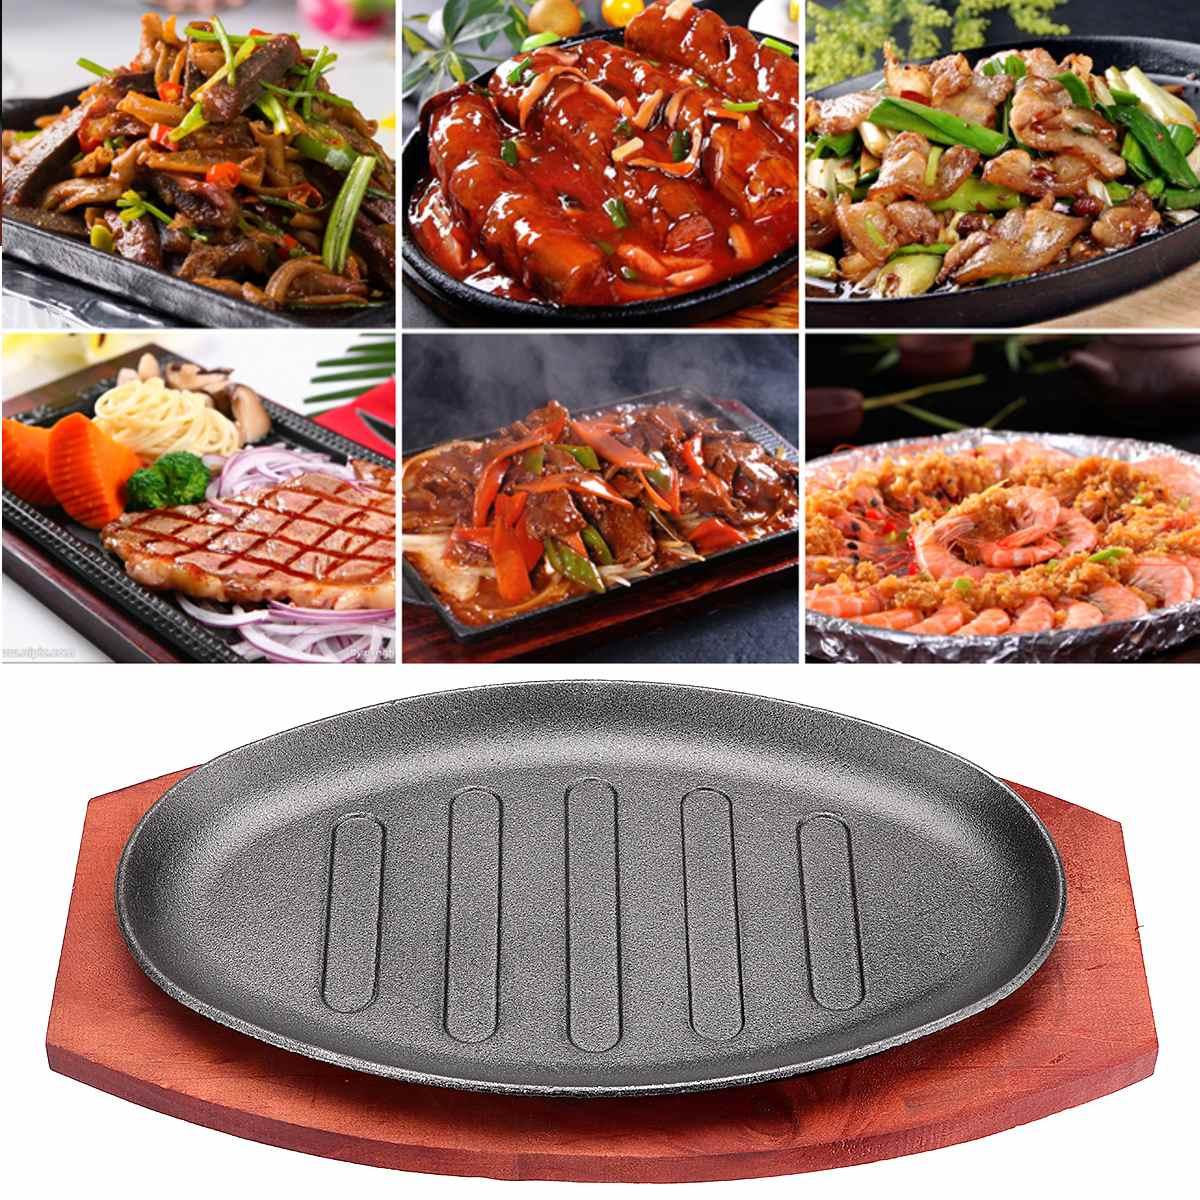 3 Sizes Cast Iron Steak Fajita Sizzling Platter Plate BBQ Grill Pan Cooking Wooden Holder